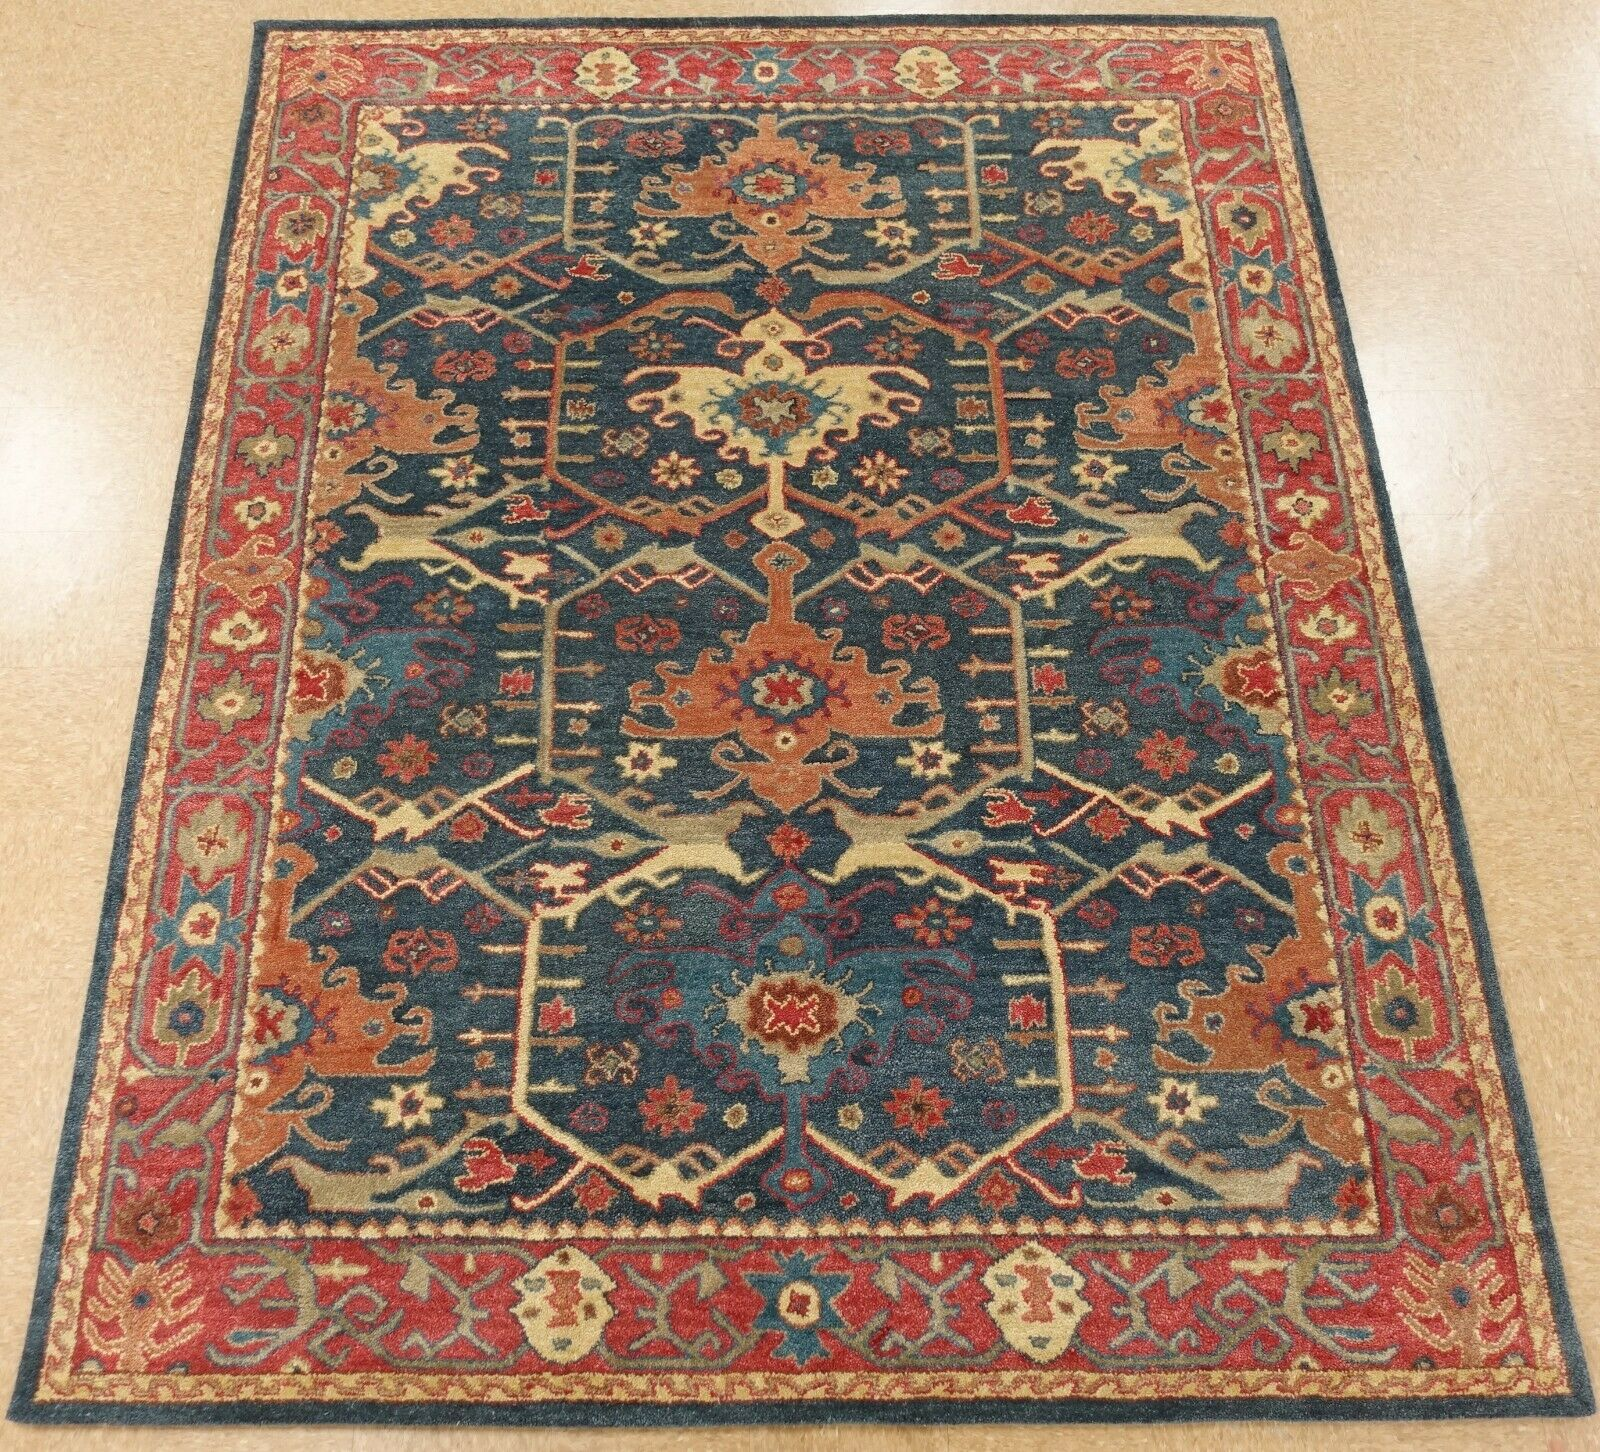 9 X 12 Pottery Barn Channing Indigo Rug New Hand Tufted Wool Carpet